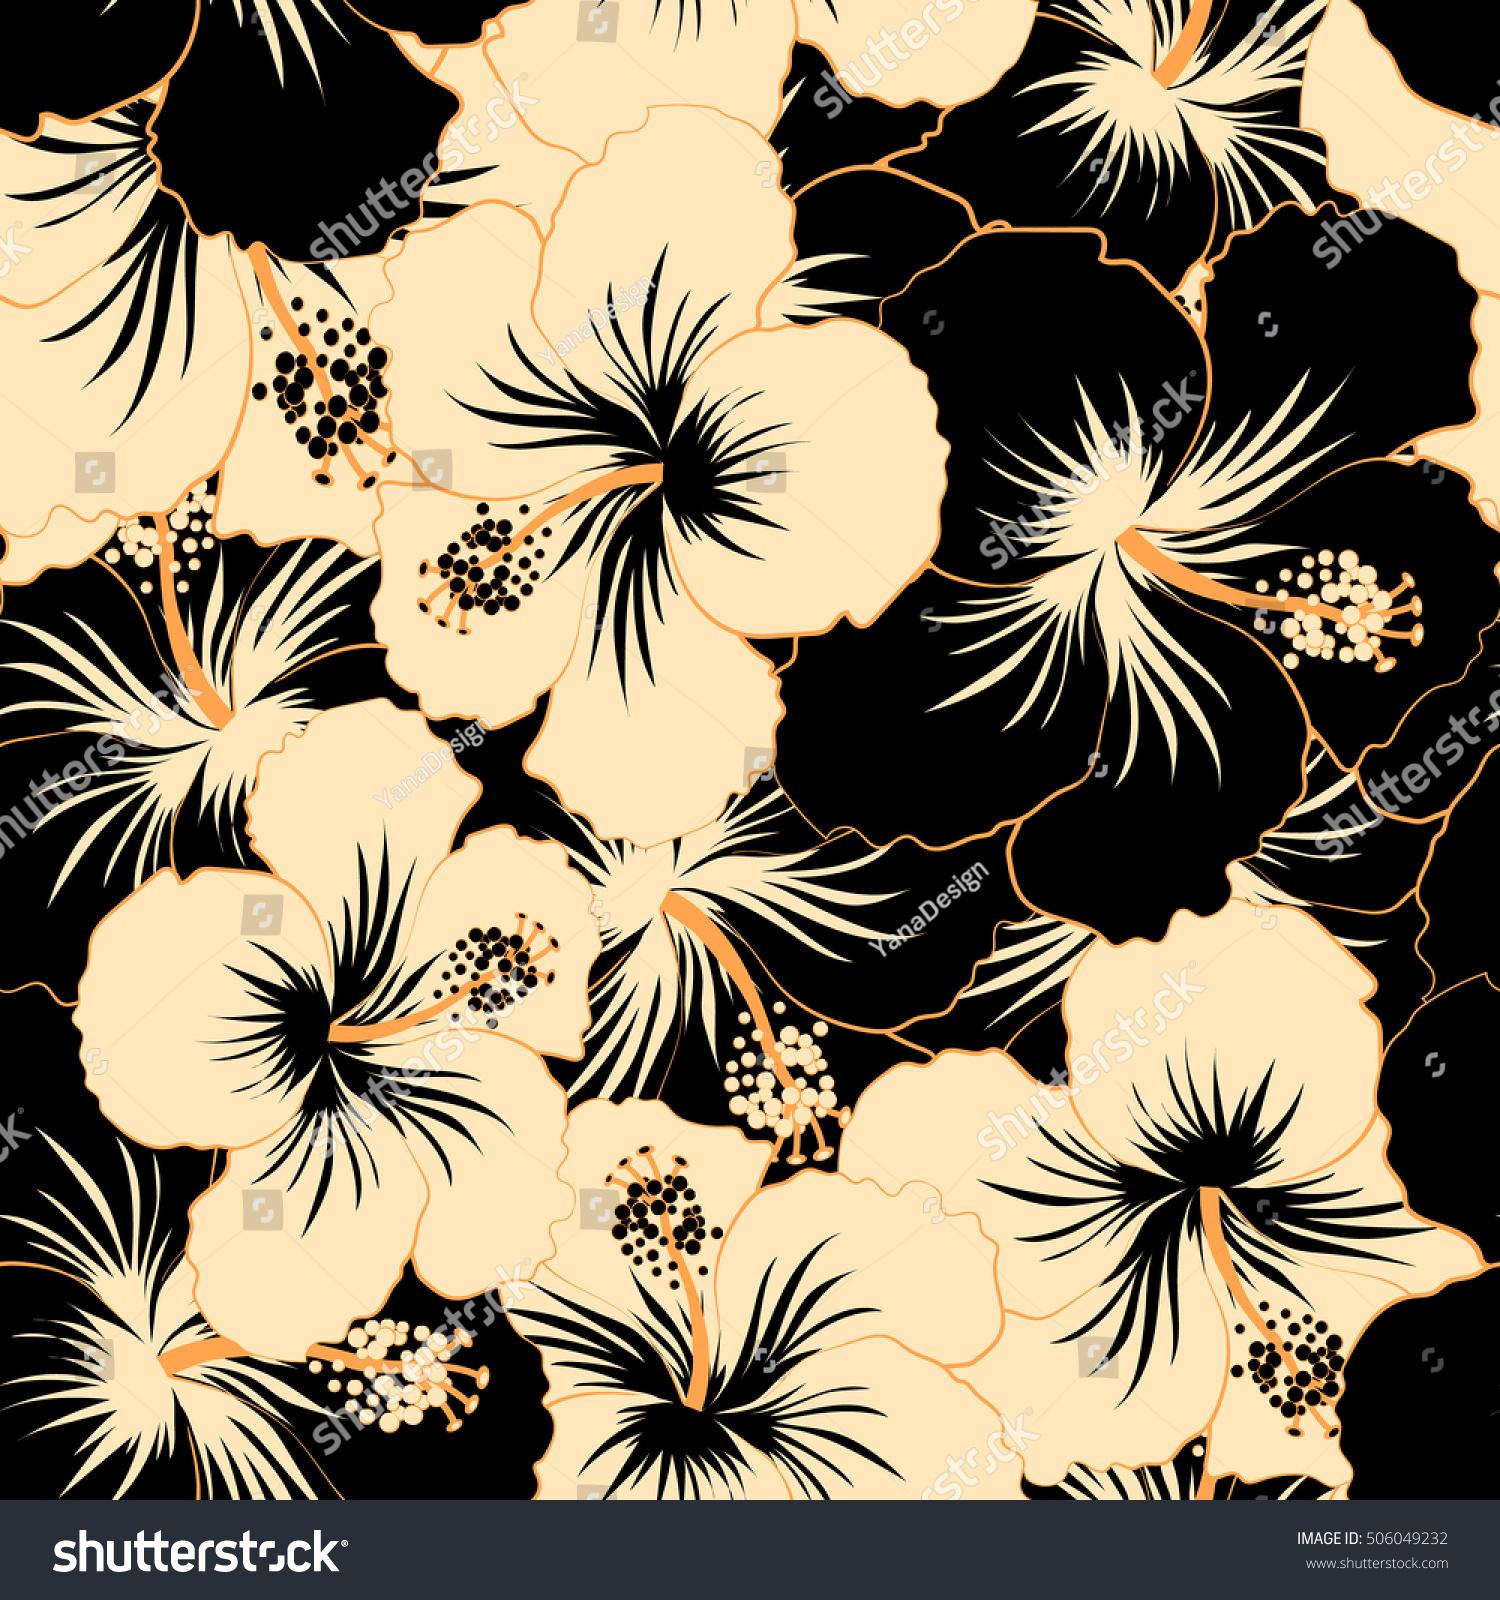 Vector illustration beige black hibiscus flowers stock vector vector illustration of beige and black hibiscus flowers seamless pattern with beige and black flowers izmirmasajfo